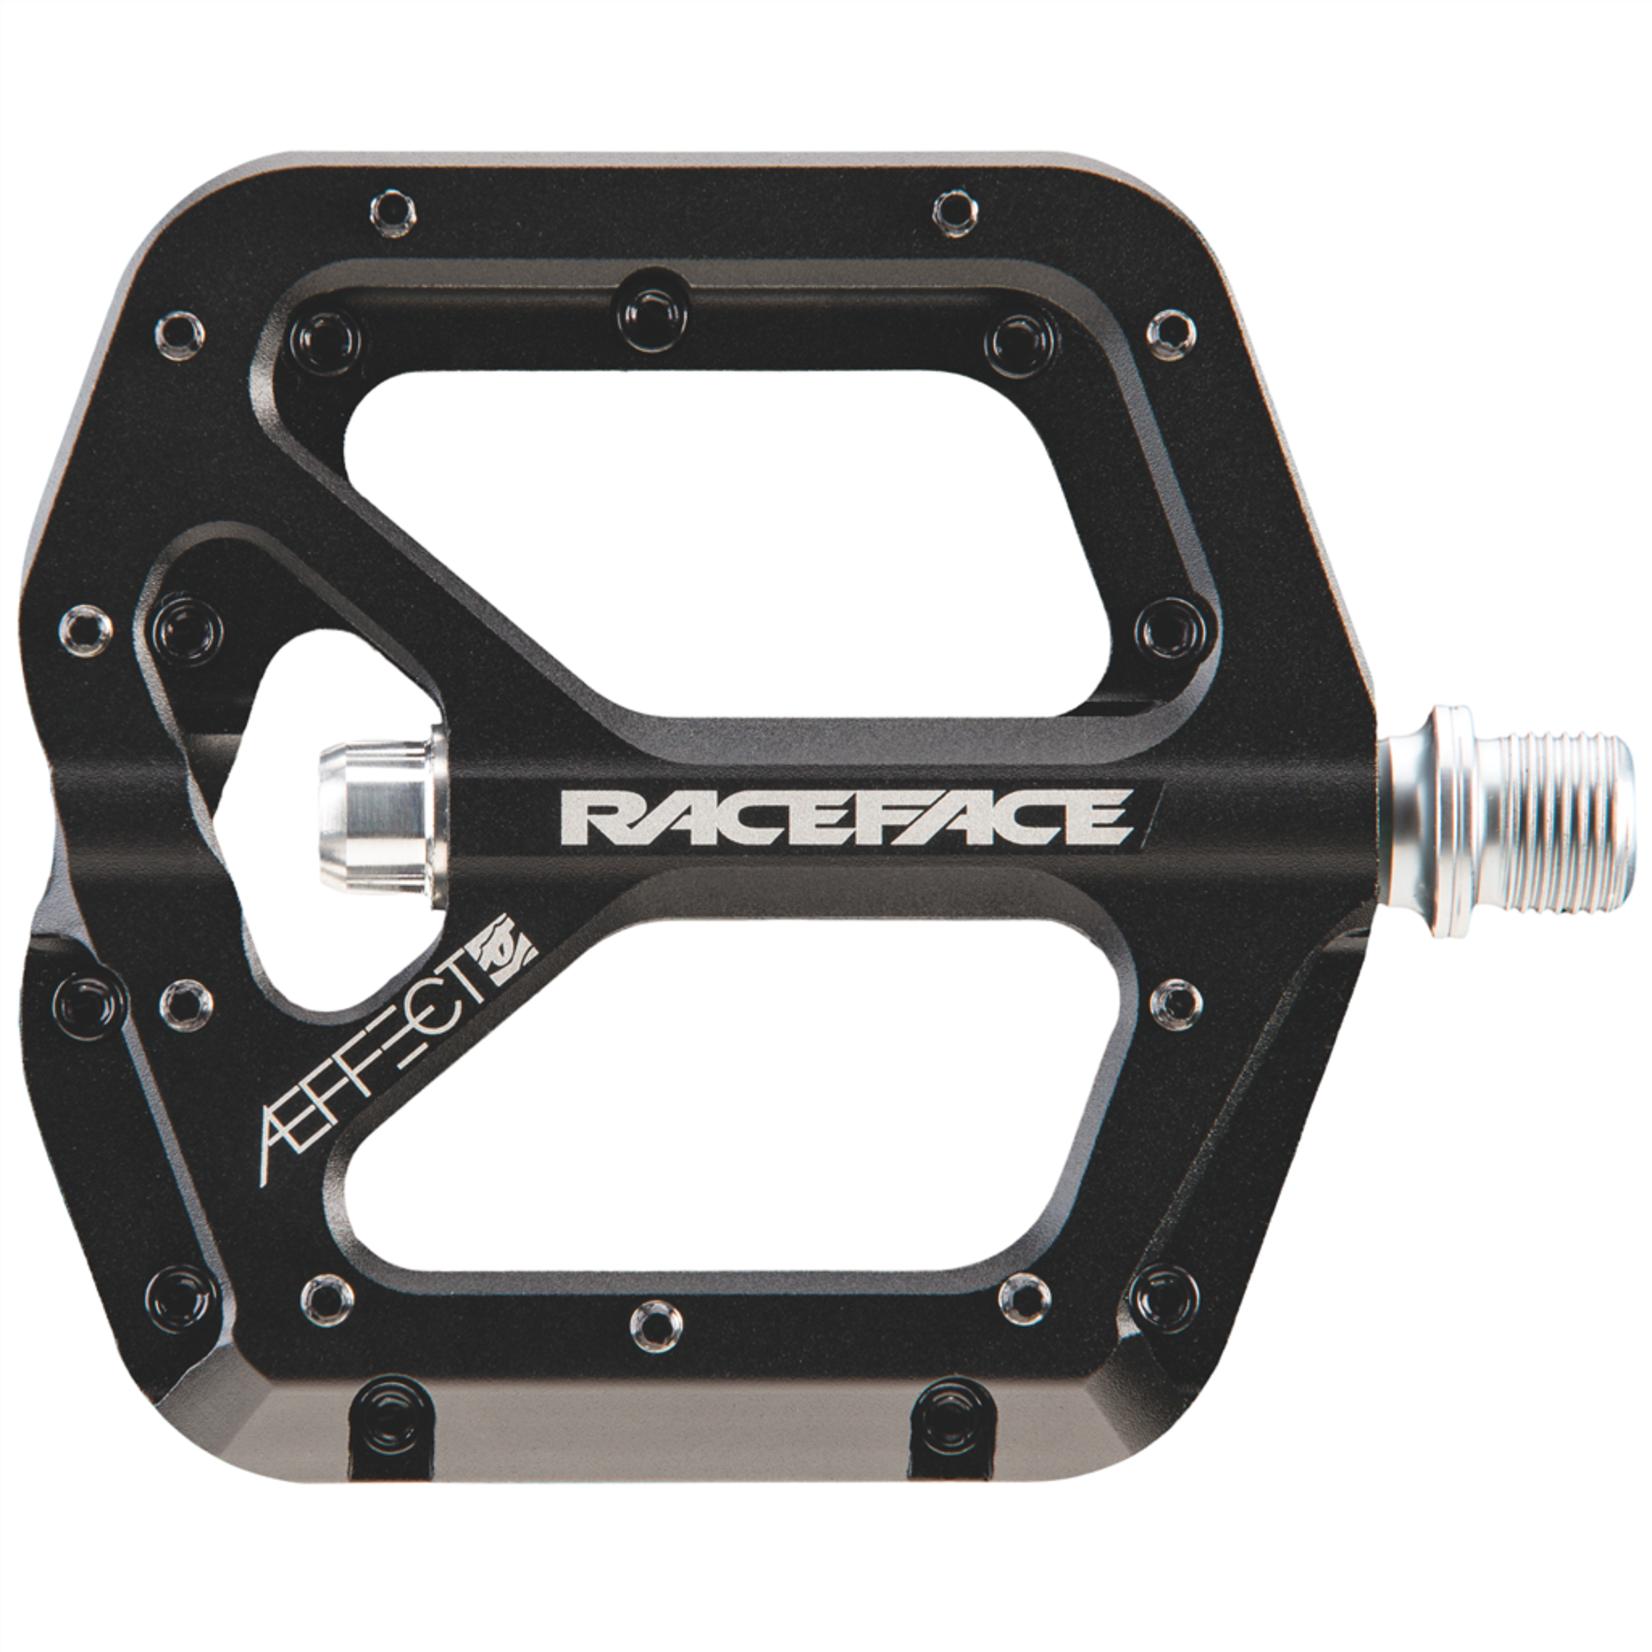 RACEFACE Race Face - Pedali Aeffect Nero